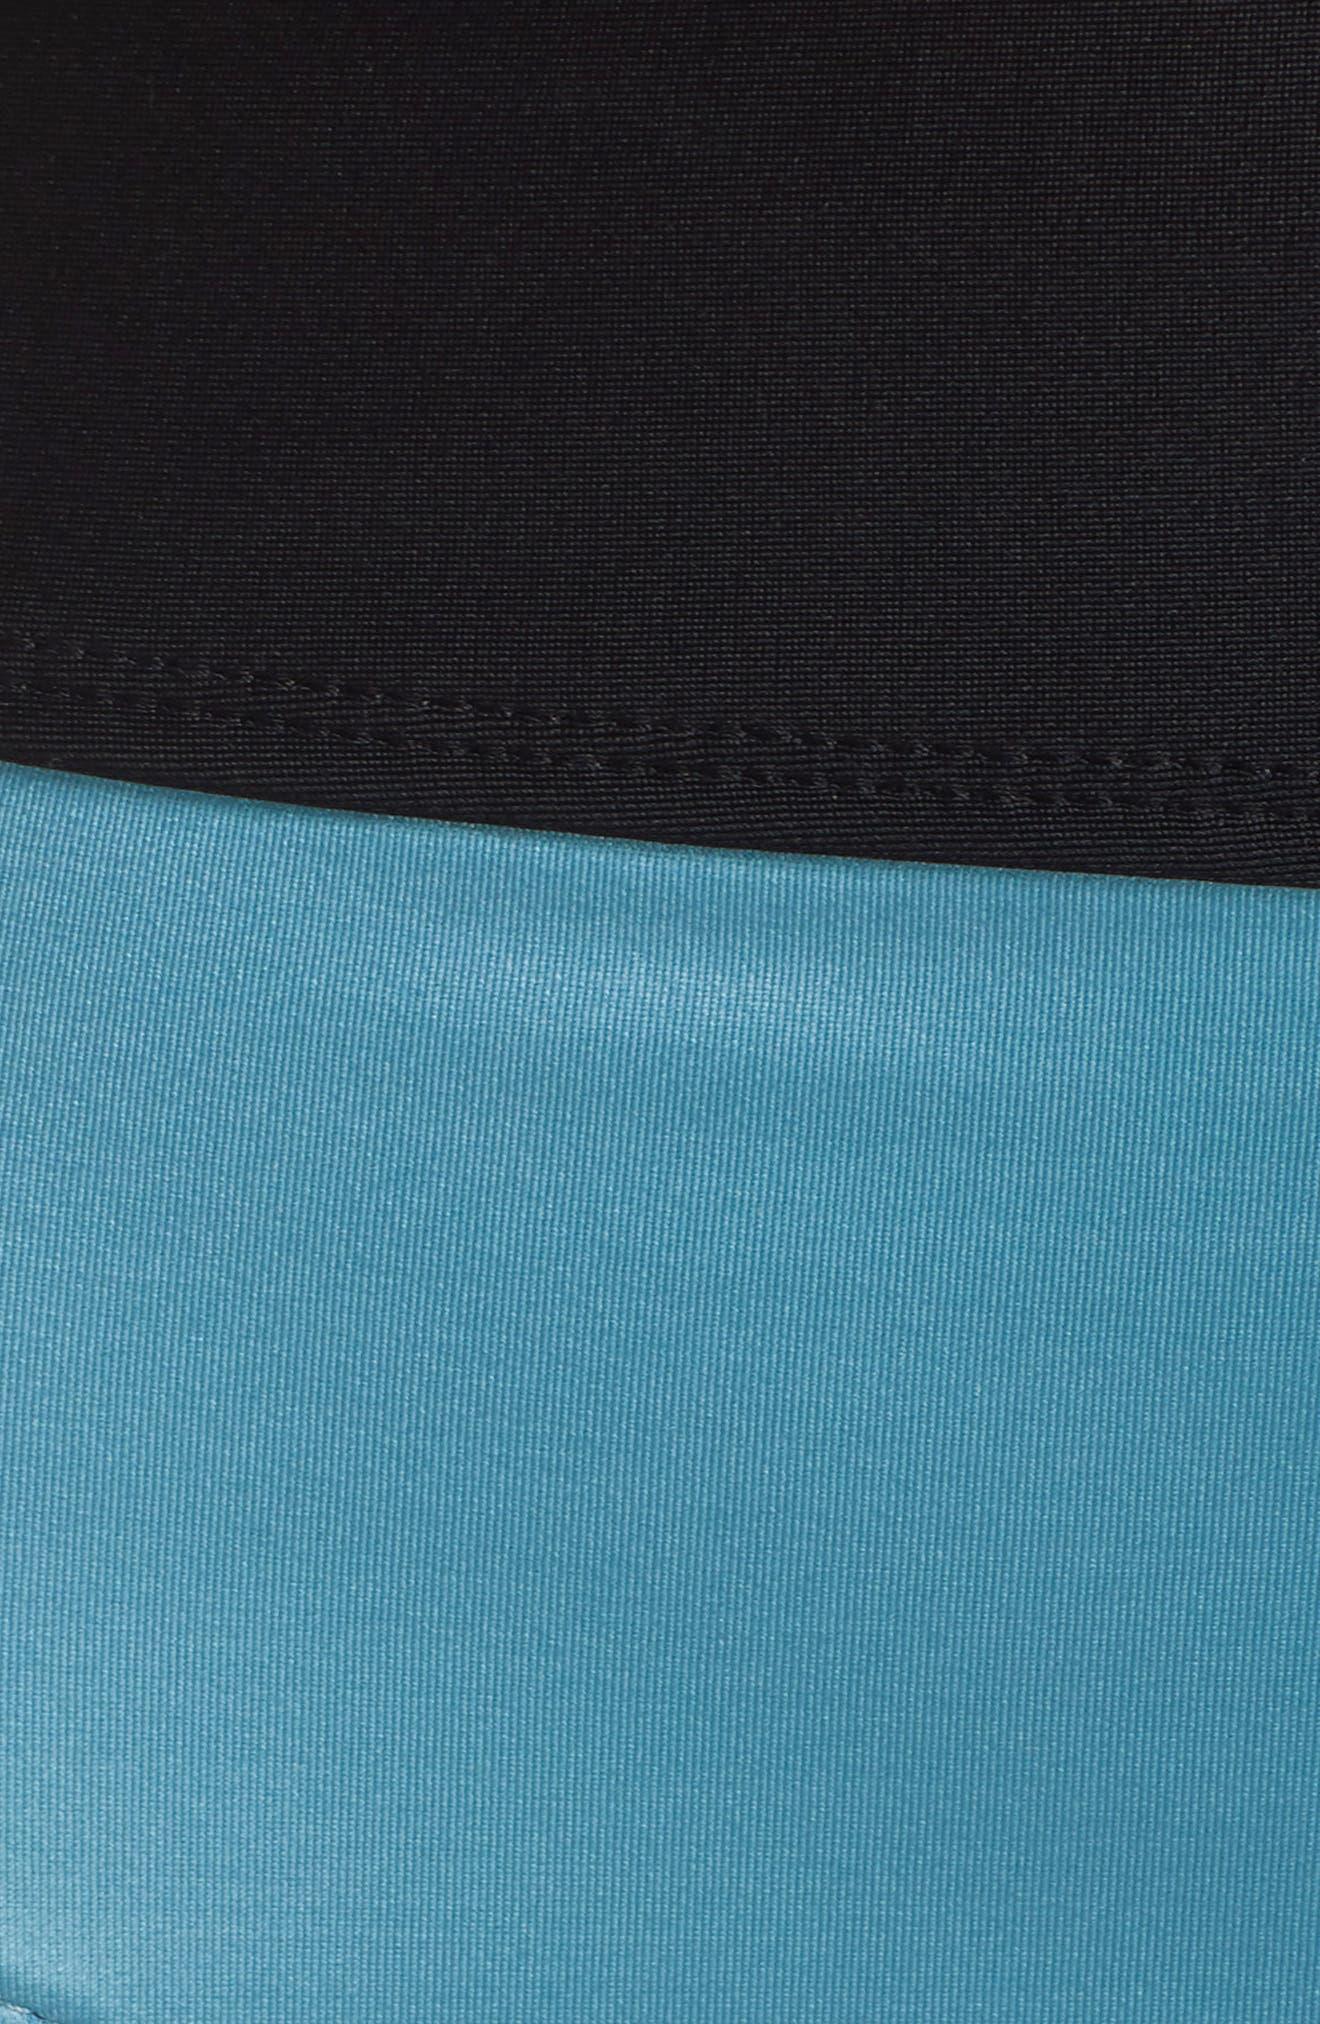 Element High Waist Bikini Bottoms,                             Alternate thumbnail 5, color,                             TEAL DOLPHIN